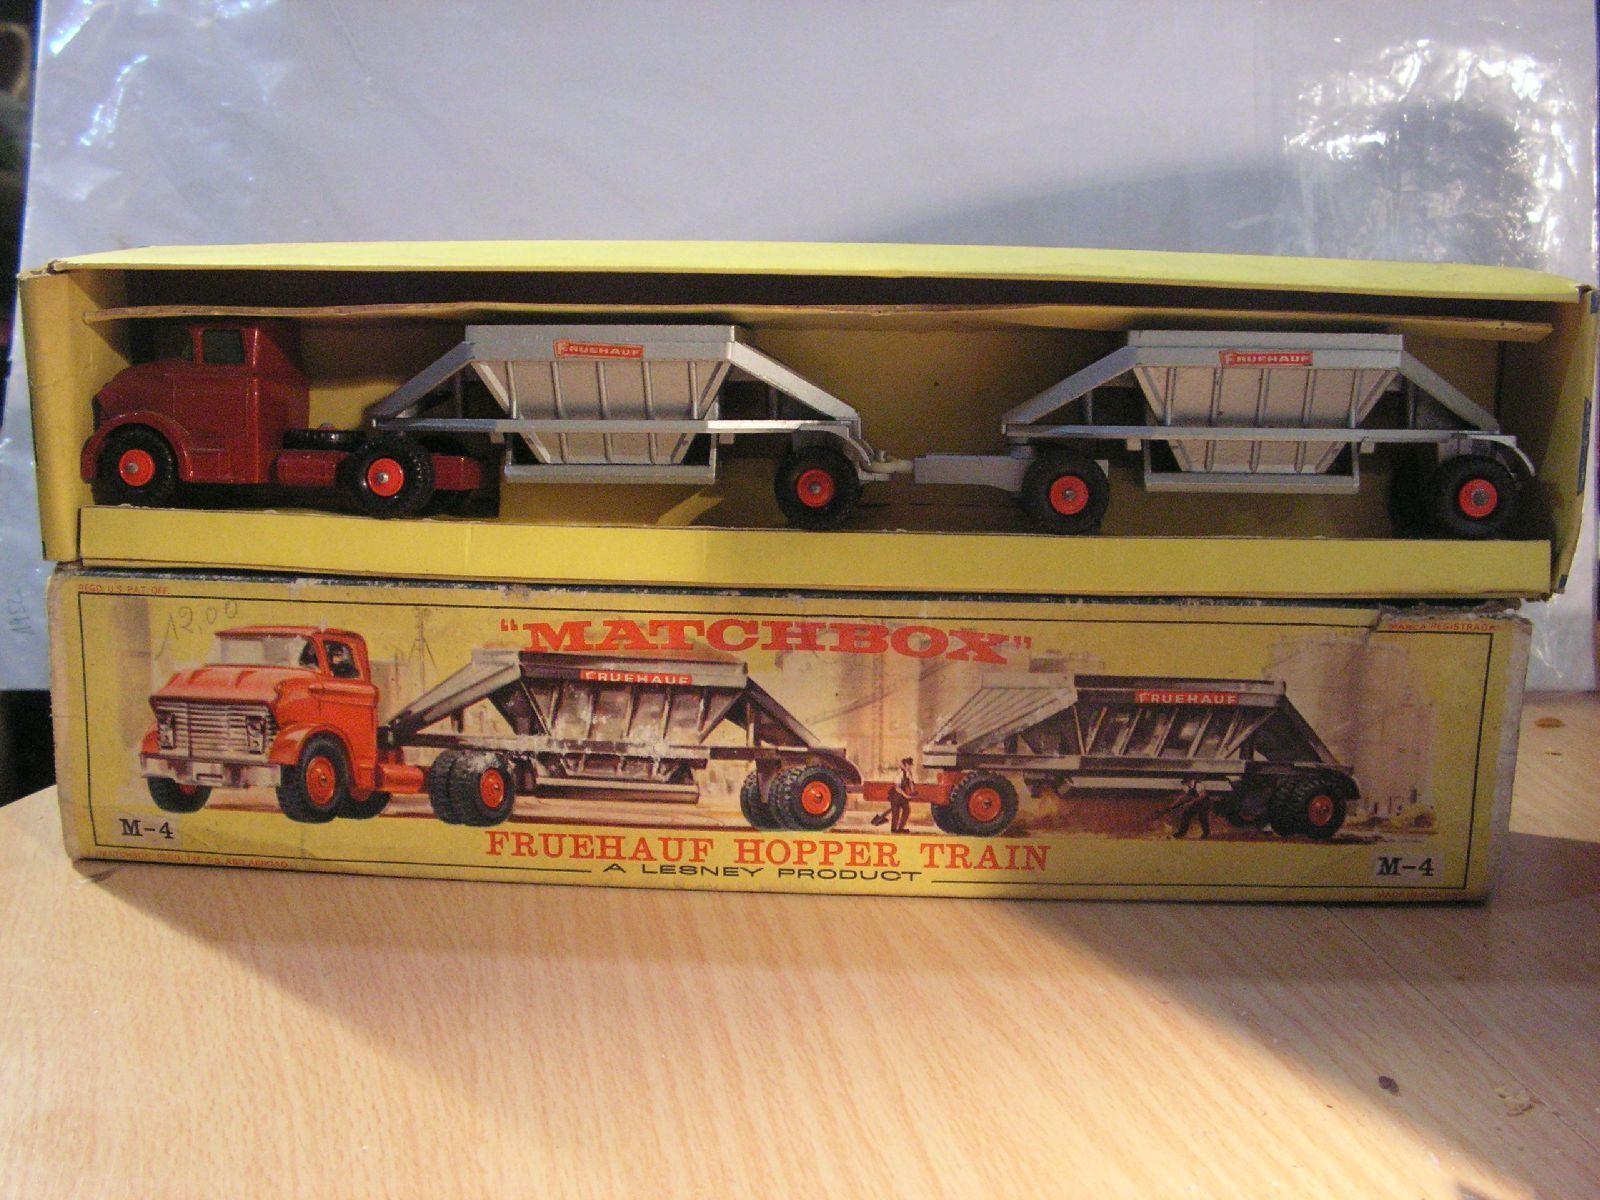 MATCHBOX major pack FRUEHAUF HOPPER TRAIN M-4